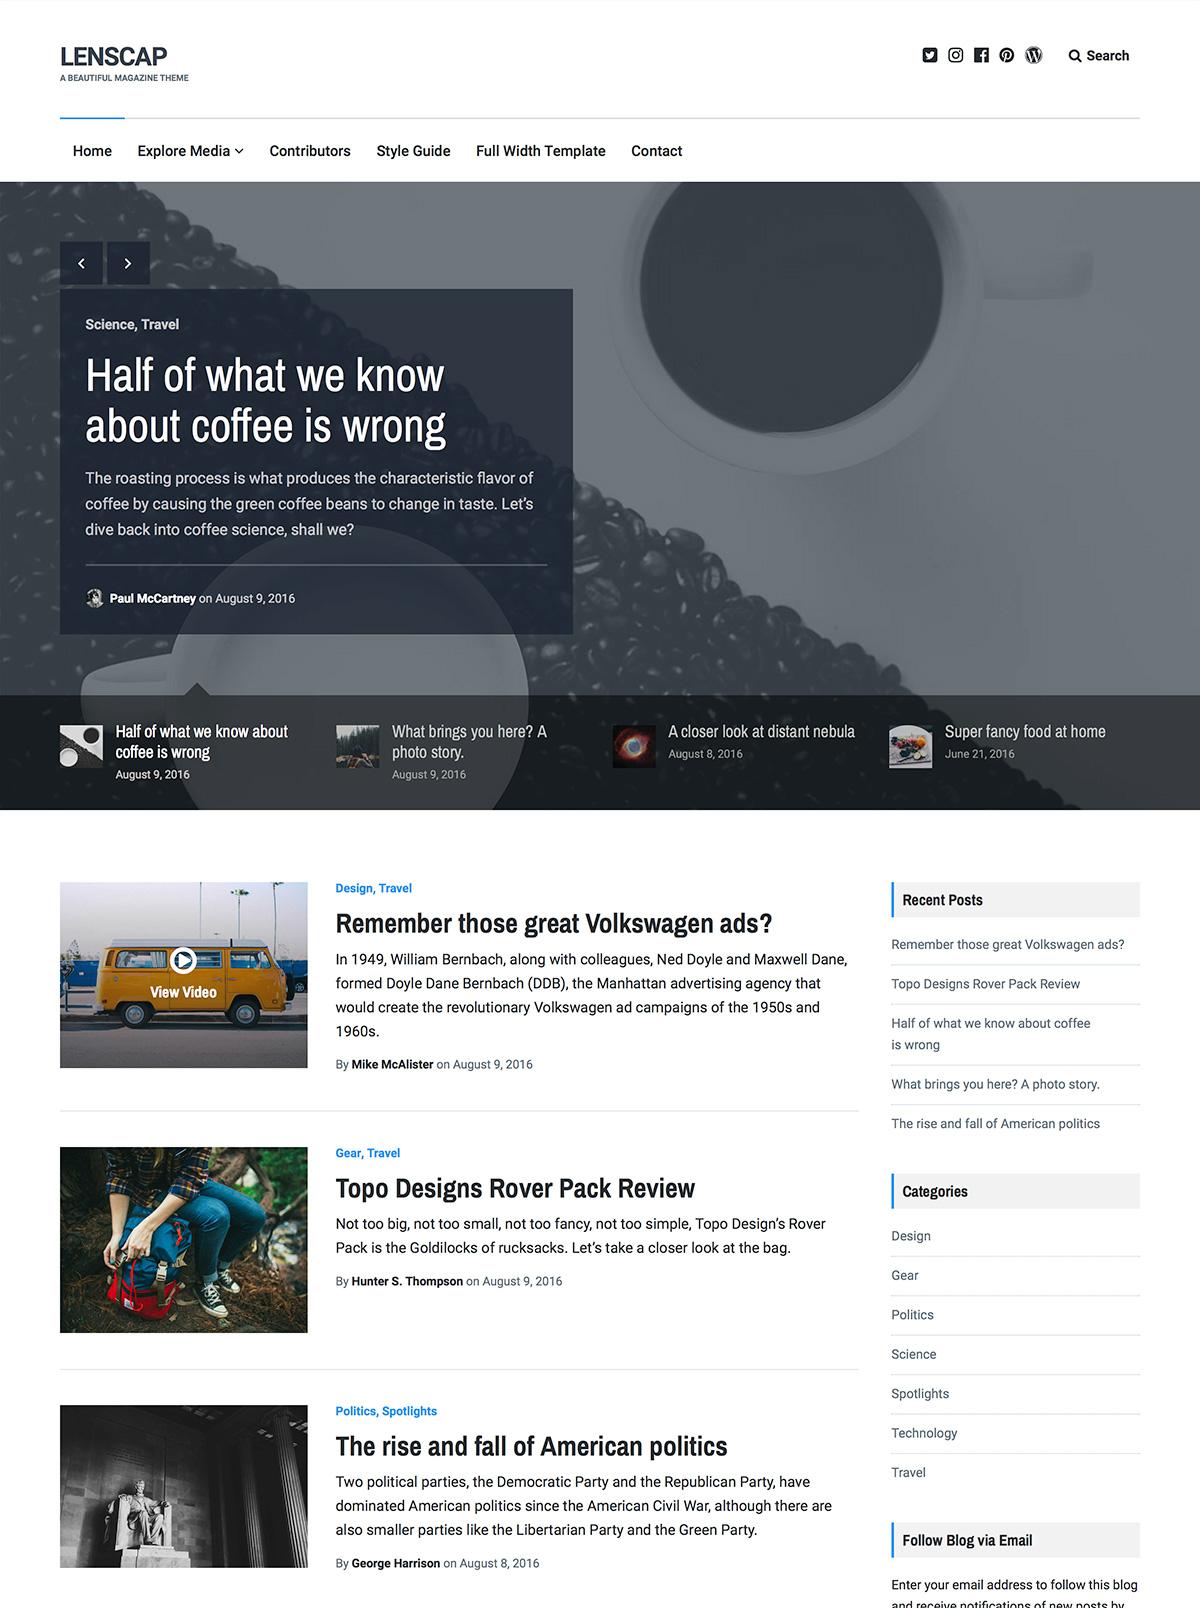 Screenshot of the Lenscap theme